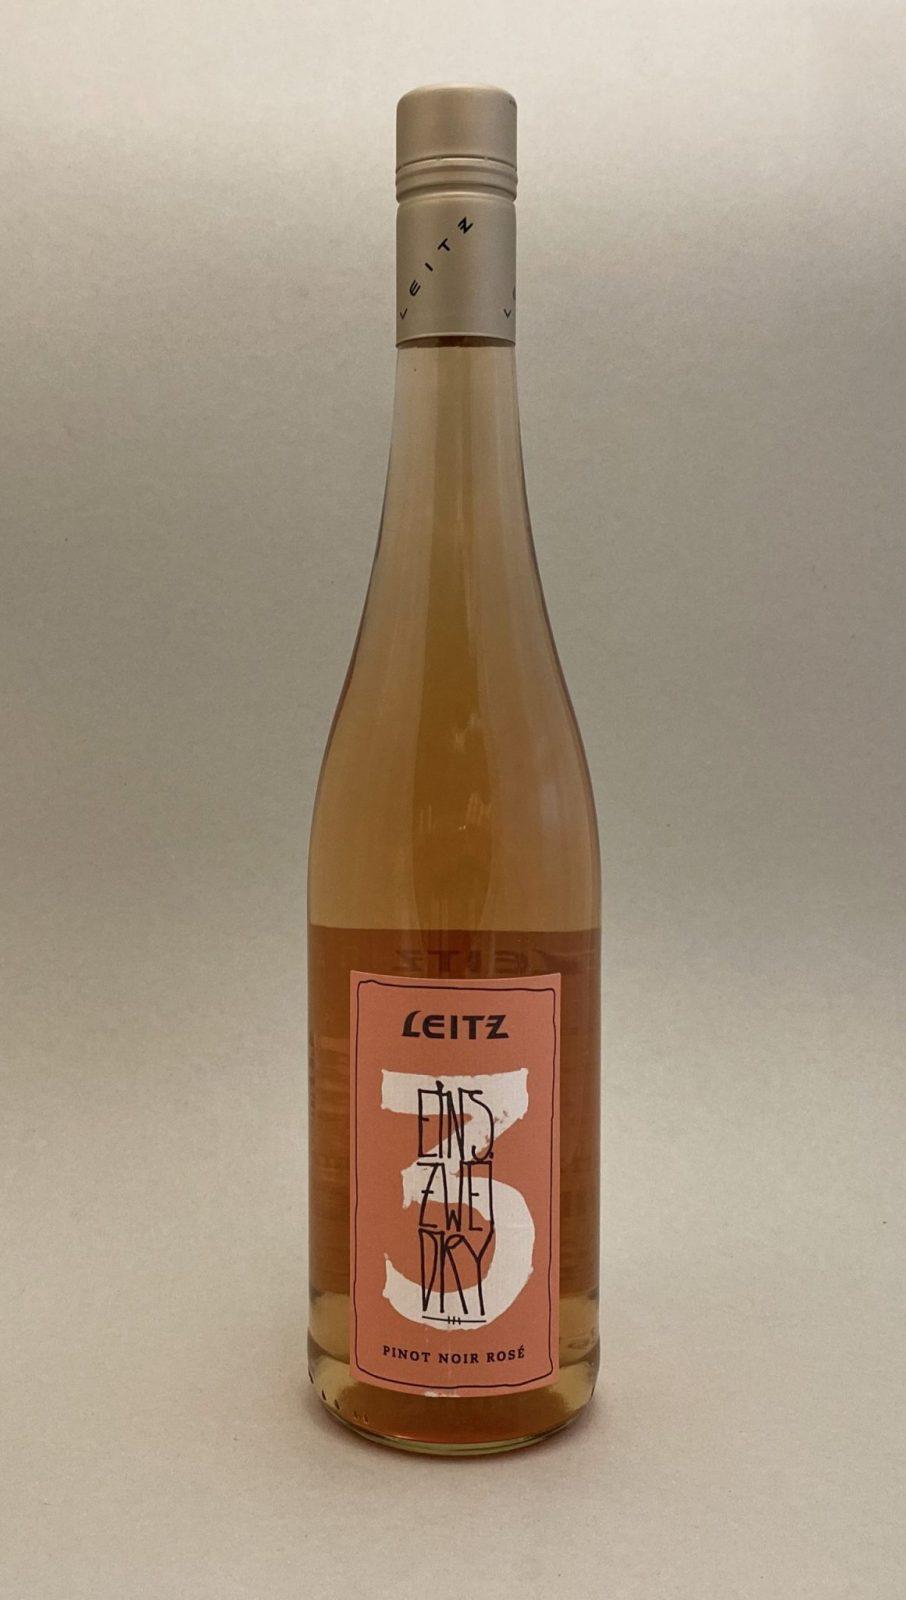 LEITZ 123 Pinot Noir Rosé, vinoteka Sunny wines slnecnice mesto, Bratislava petrzalka, vino ružové z Nemecka